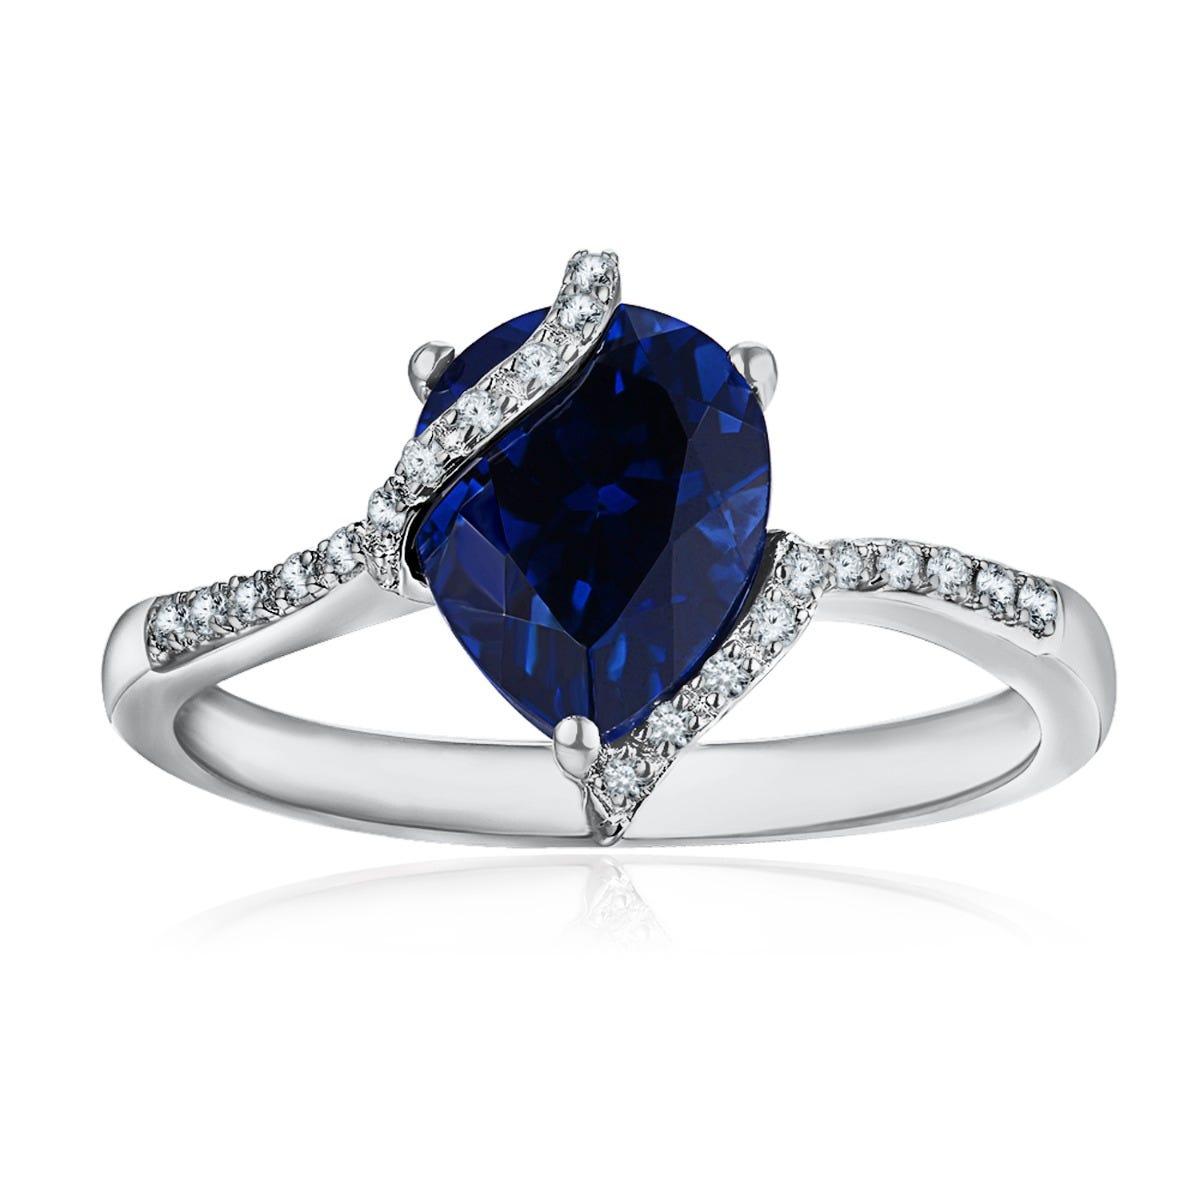 Pear Shaped Diamond Sapphire Swirl Ring in 10k White Gold